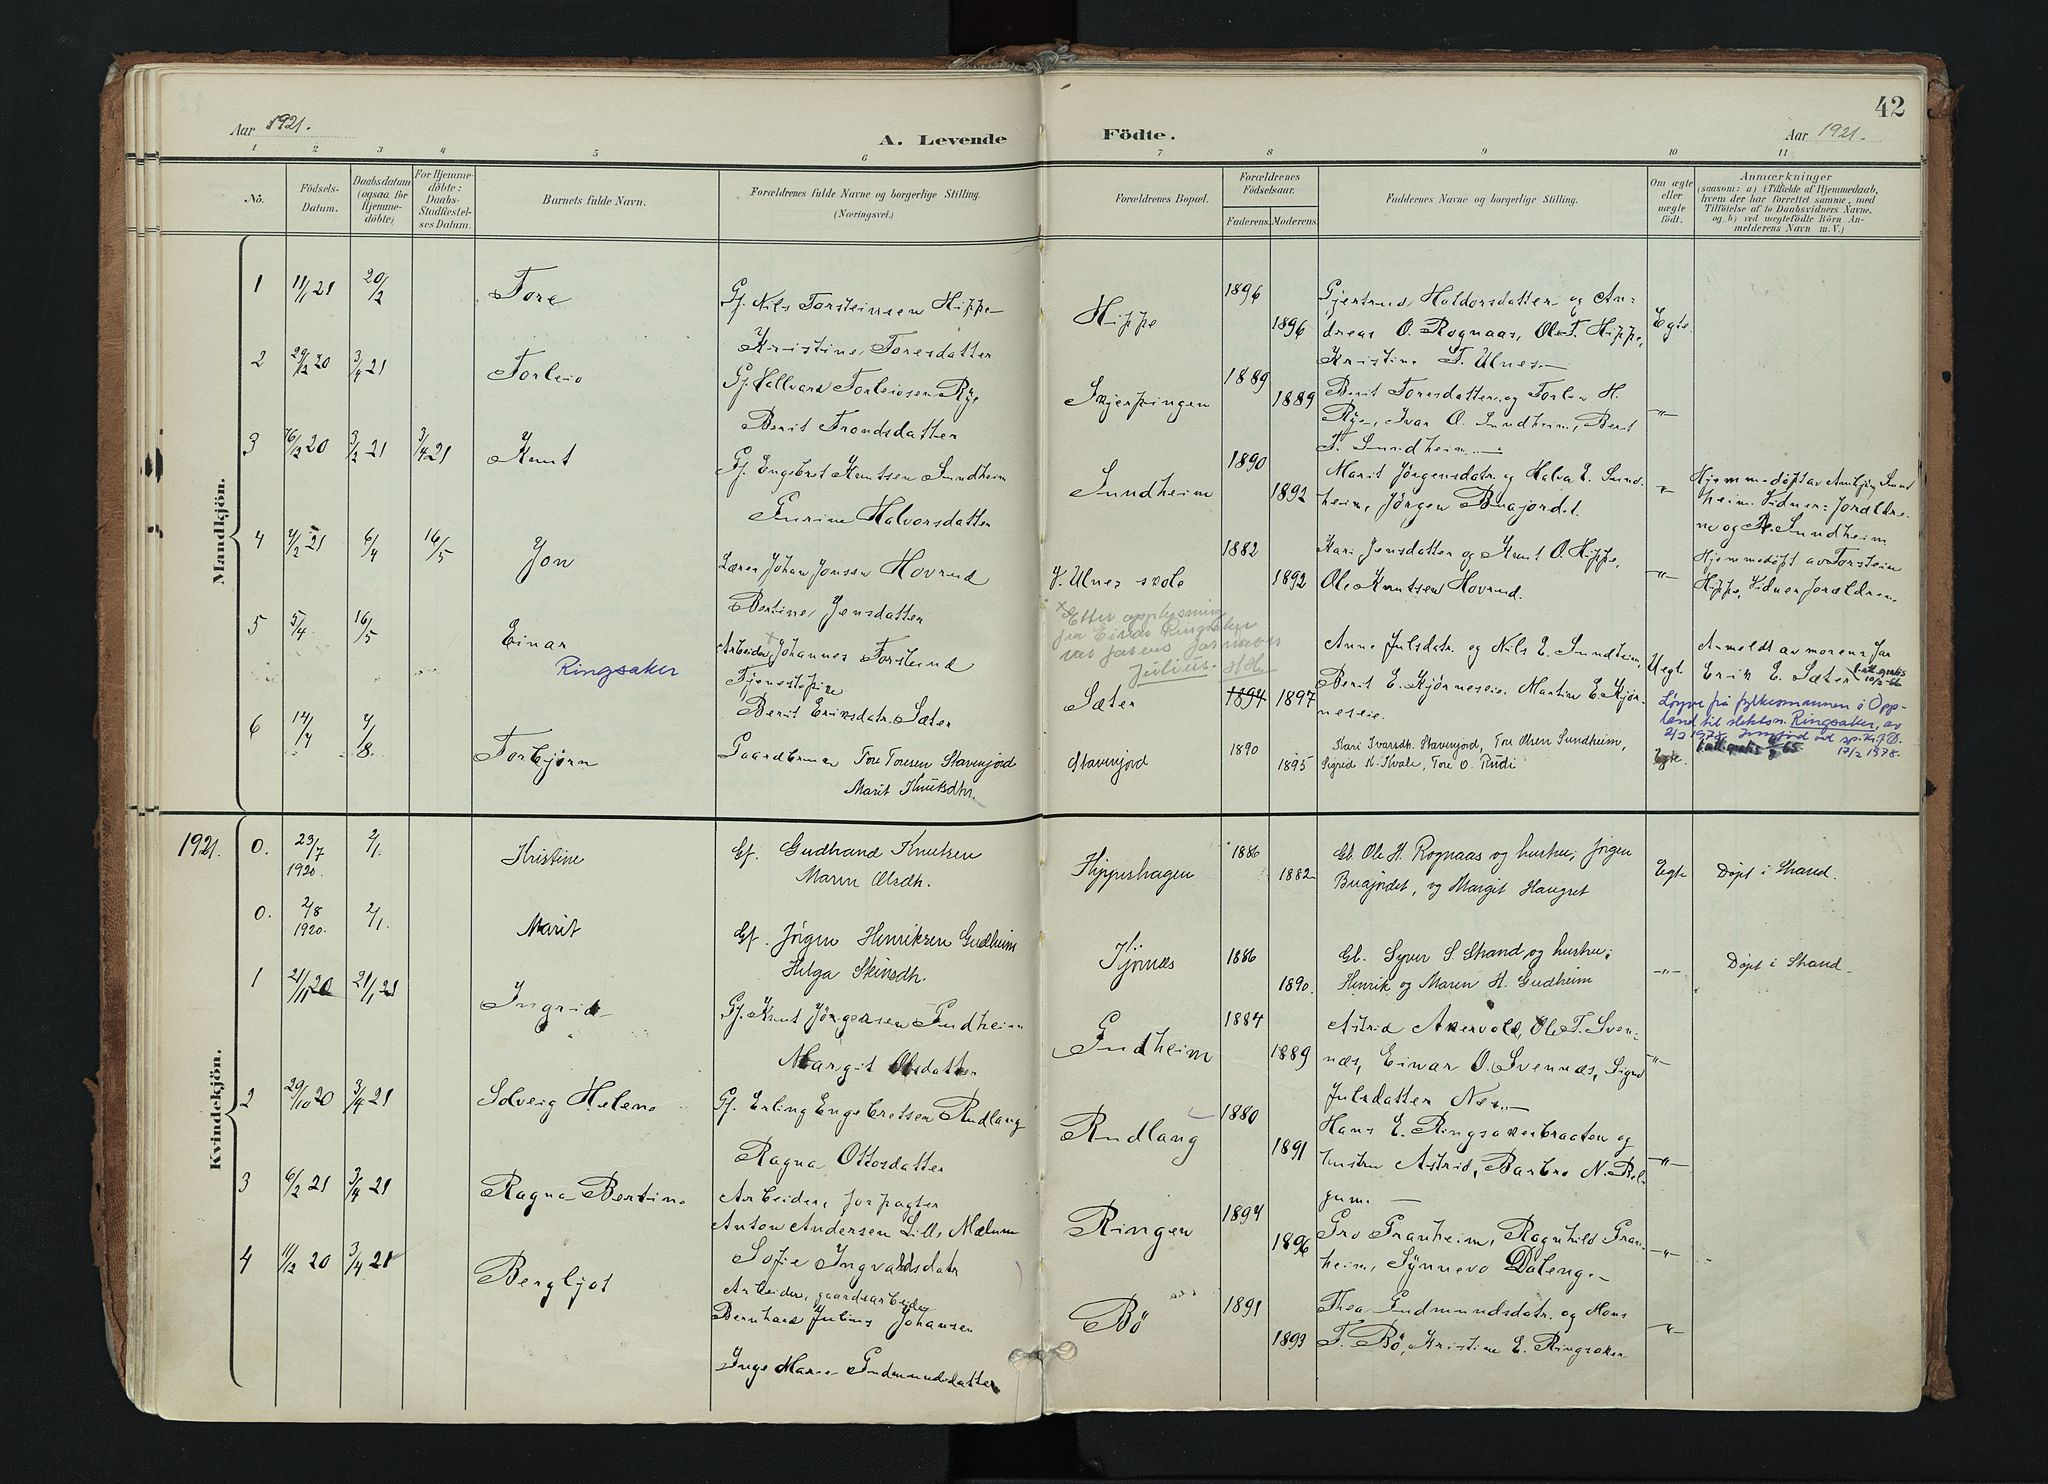 SAH, Nord-Aurdal prestekontor, Ministerialbok nr. 17, 1897-1926, s. 42